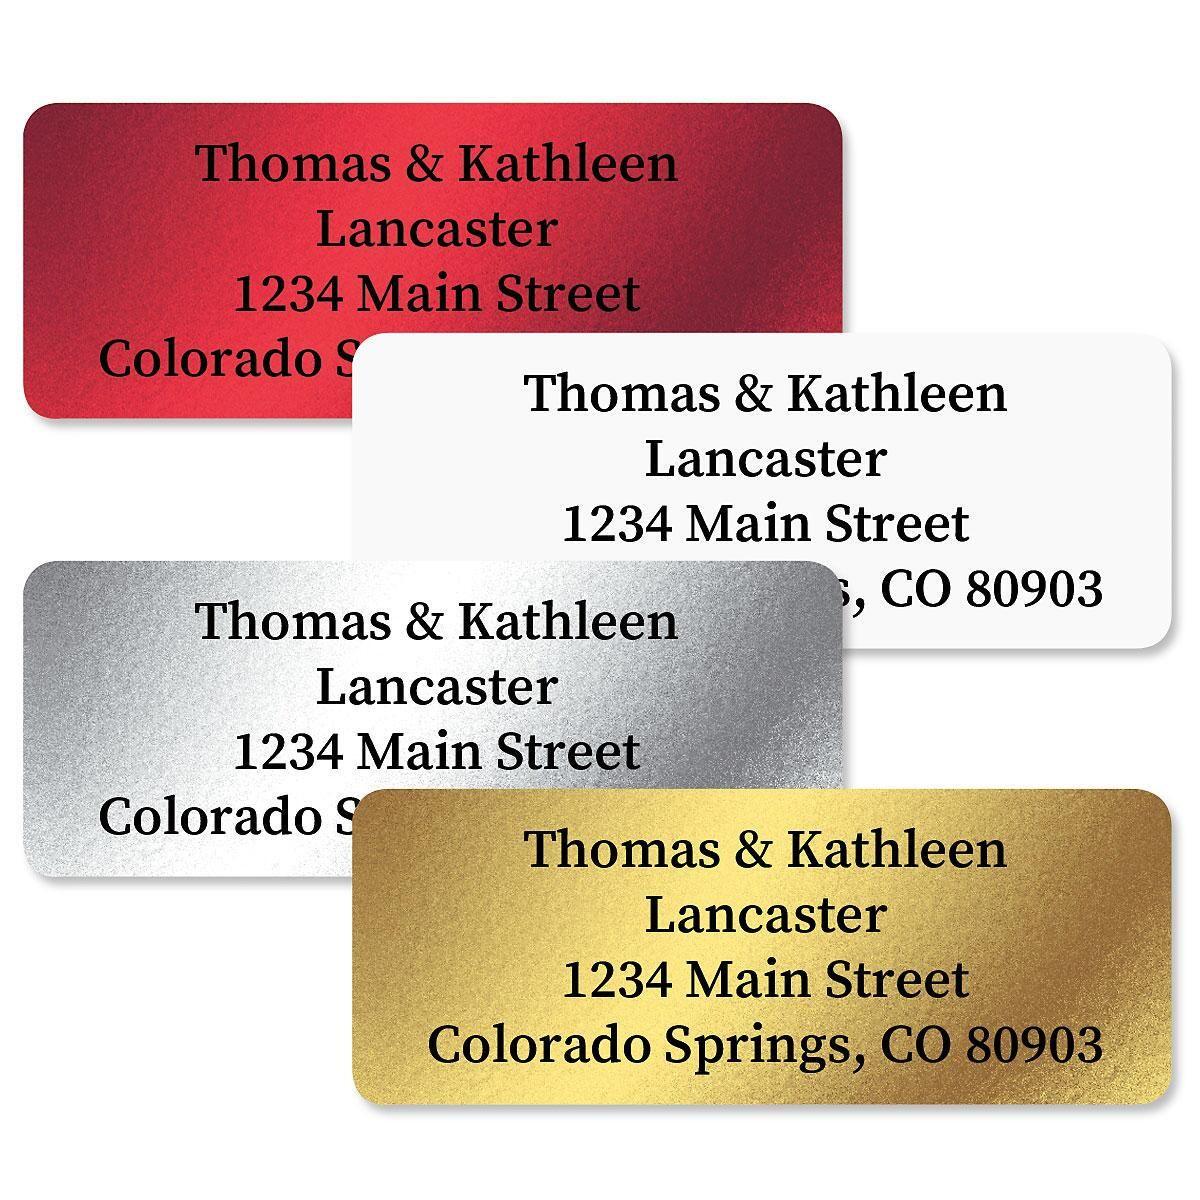 Foil Assortment Address Labels  (4 Colors) - 240 Count Sheets